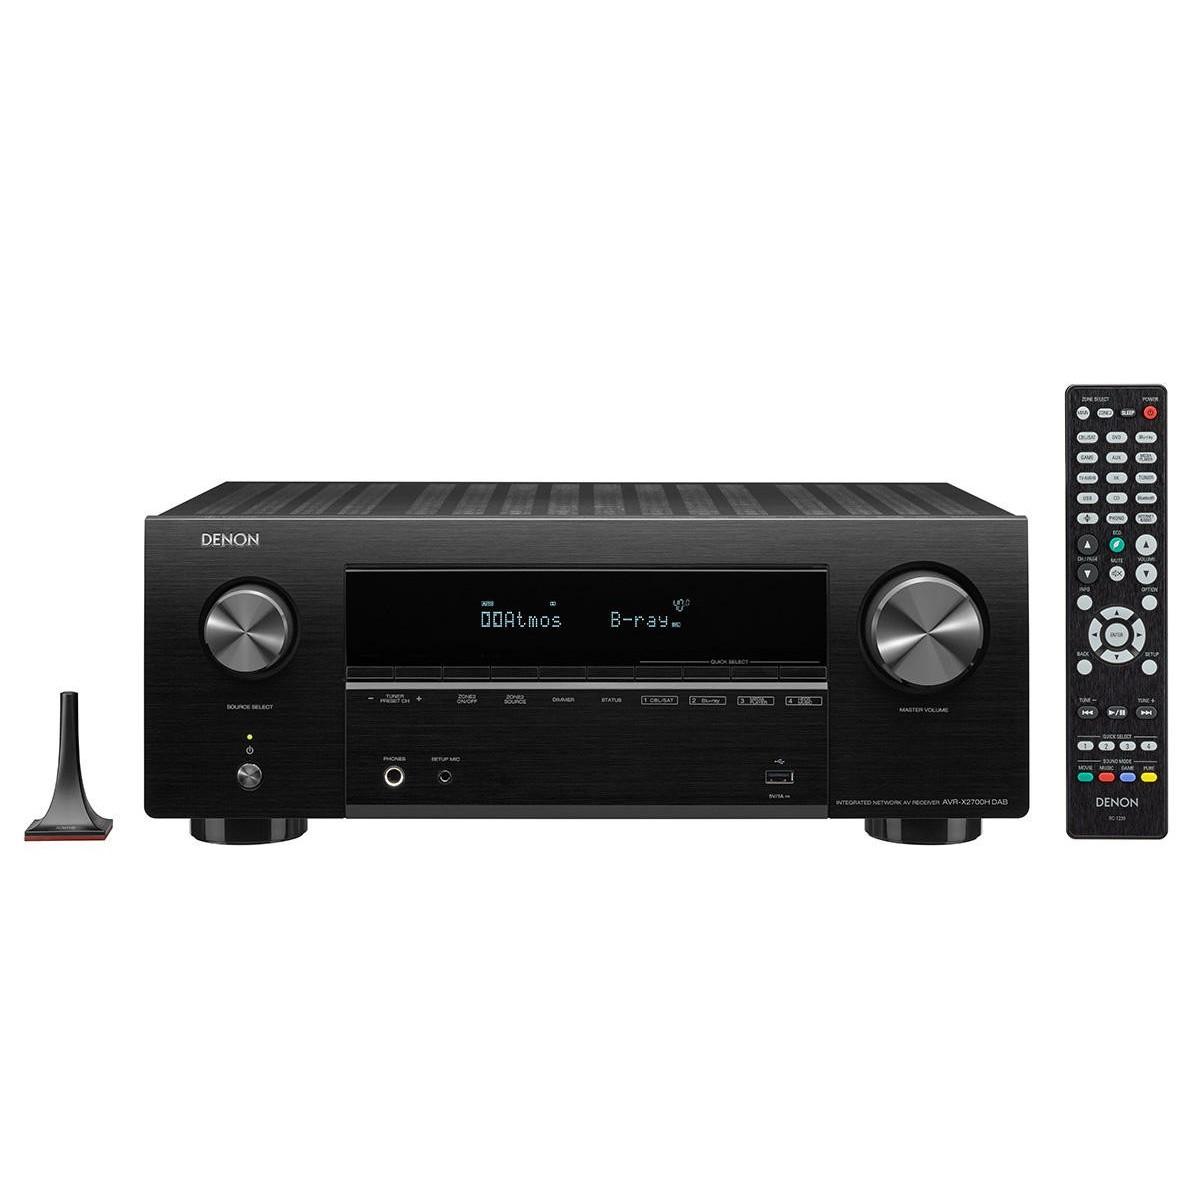 AV-Receiver 7.2 HD AVR-X2700H DAB